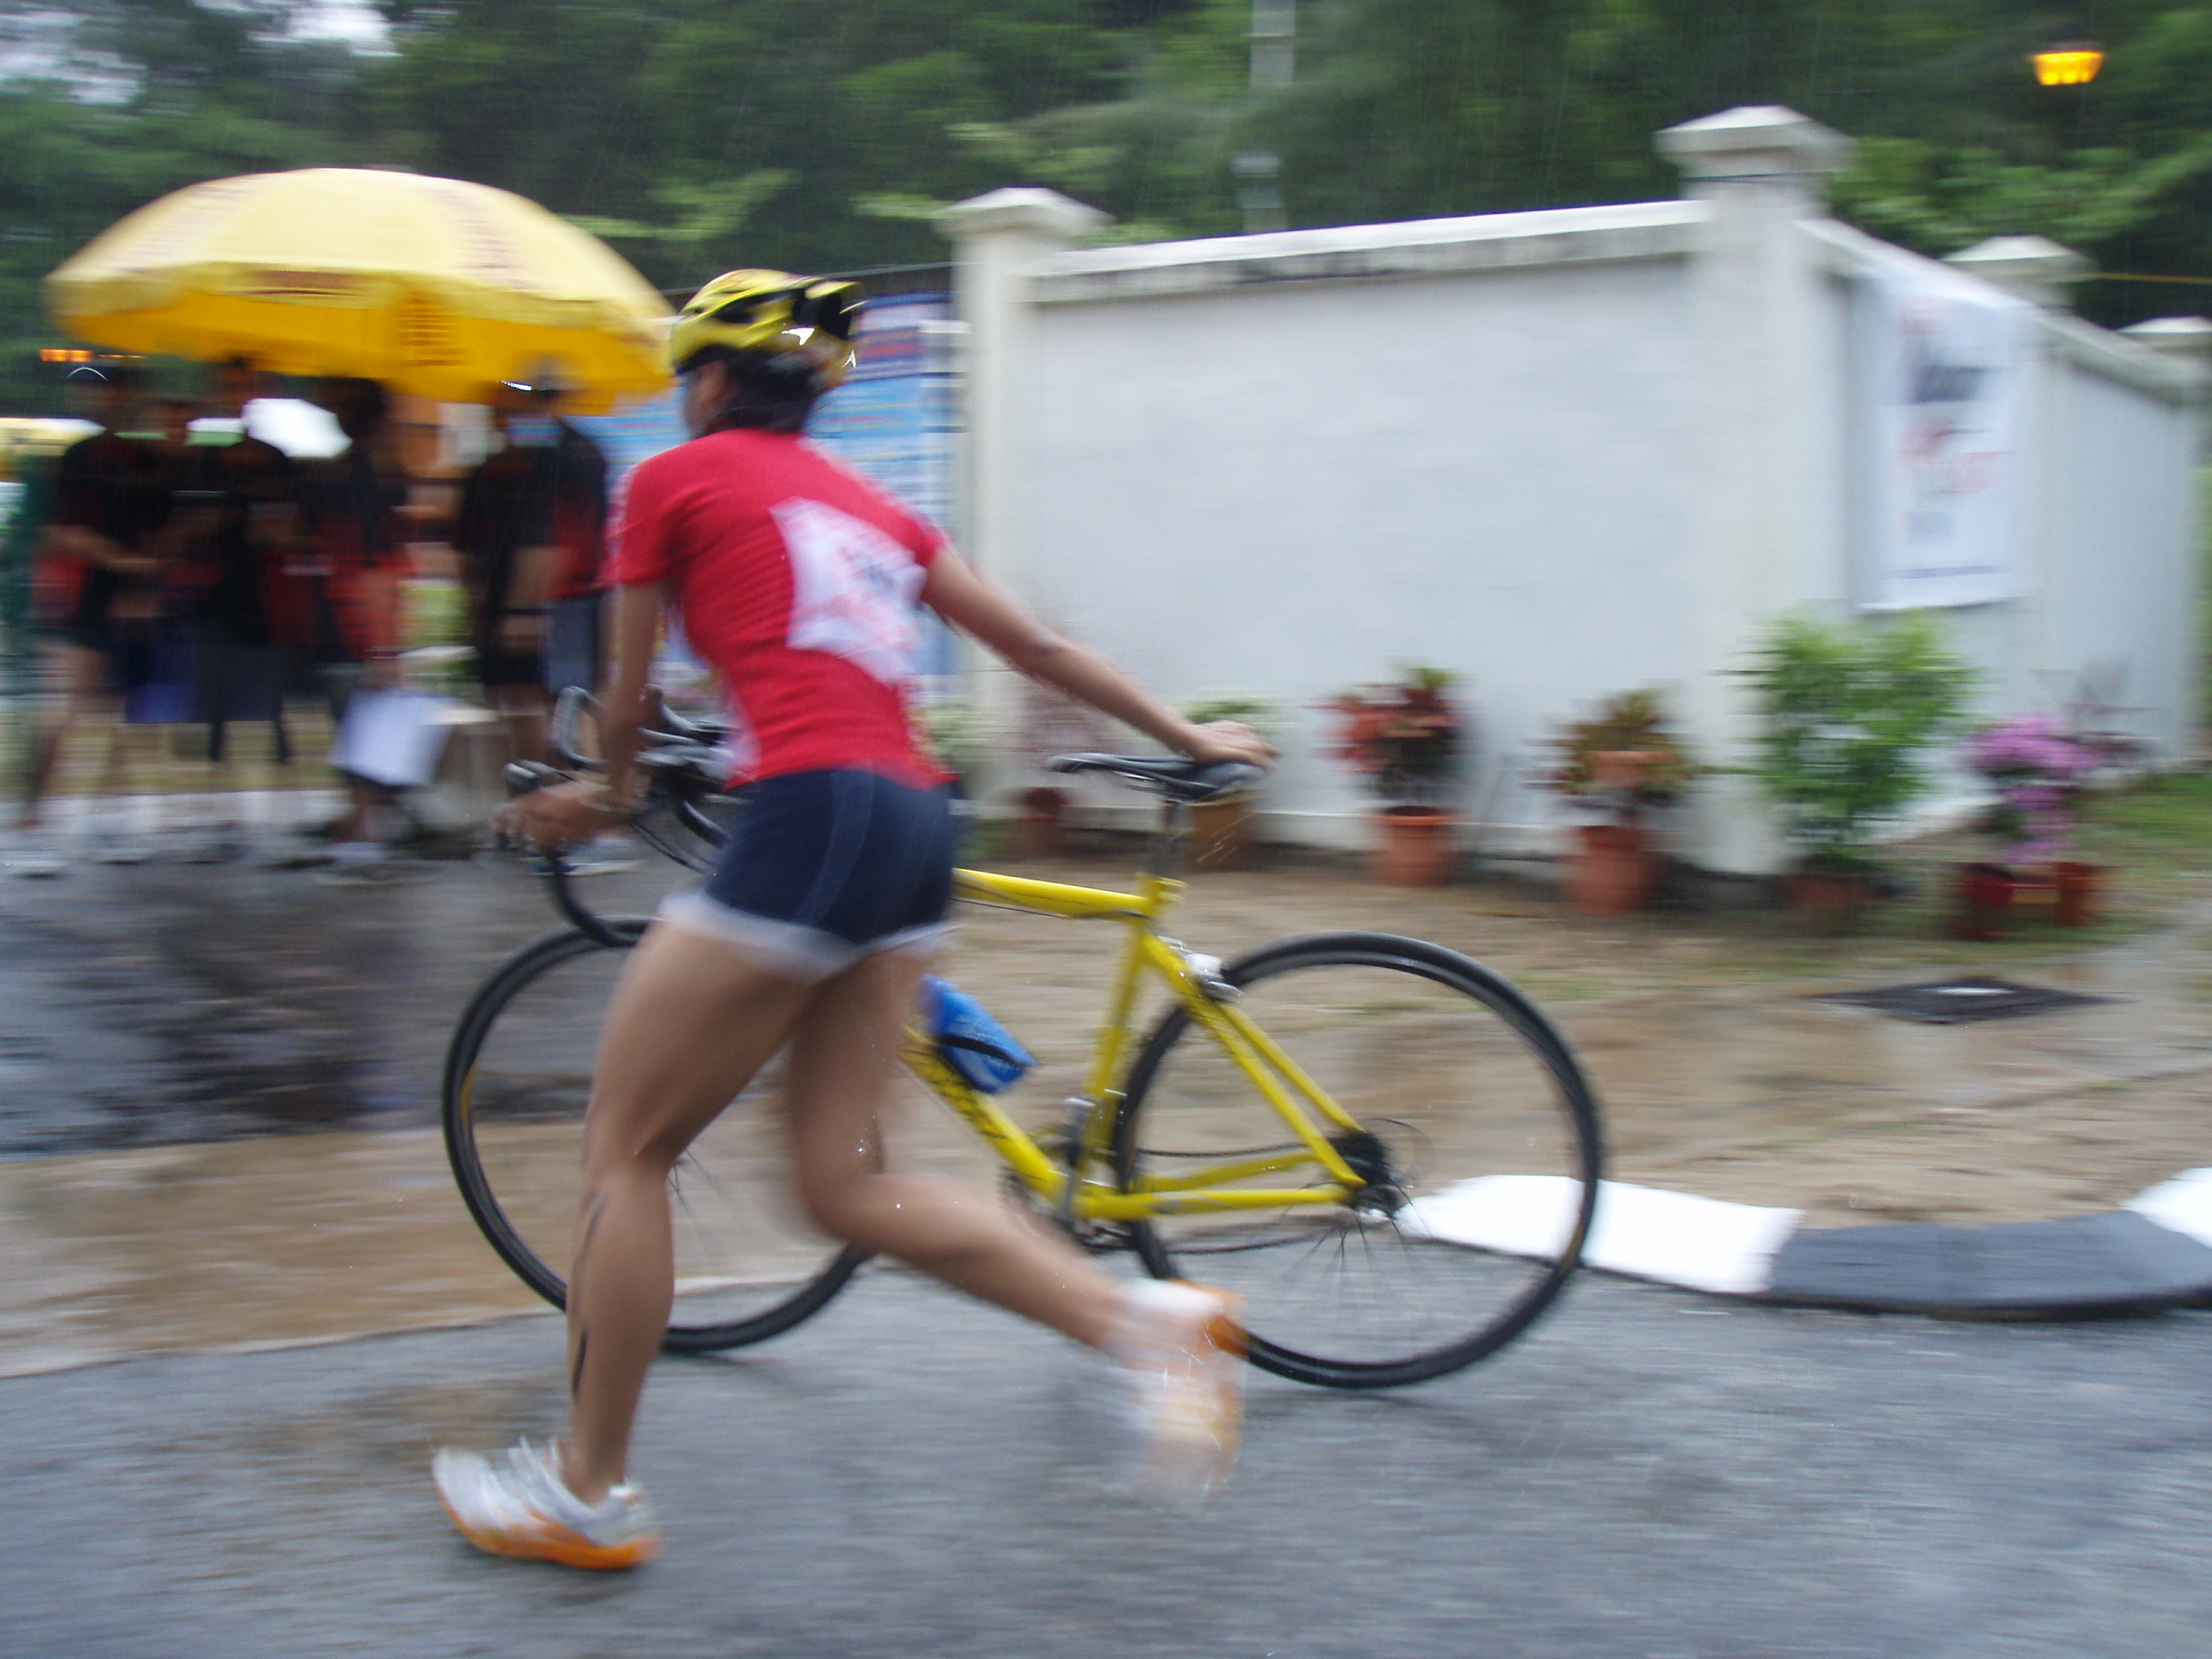 Port Dickson Triathlon 2007, my 2nd Sprint Tri. photographer manage to capture me arse during bike-run transition.